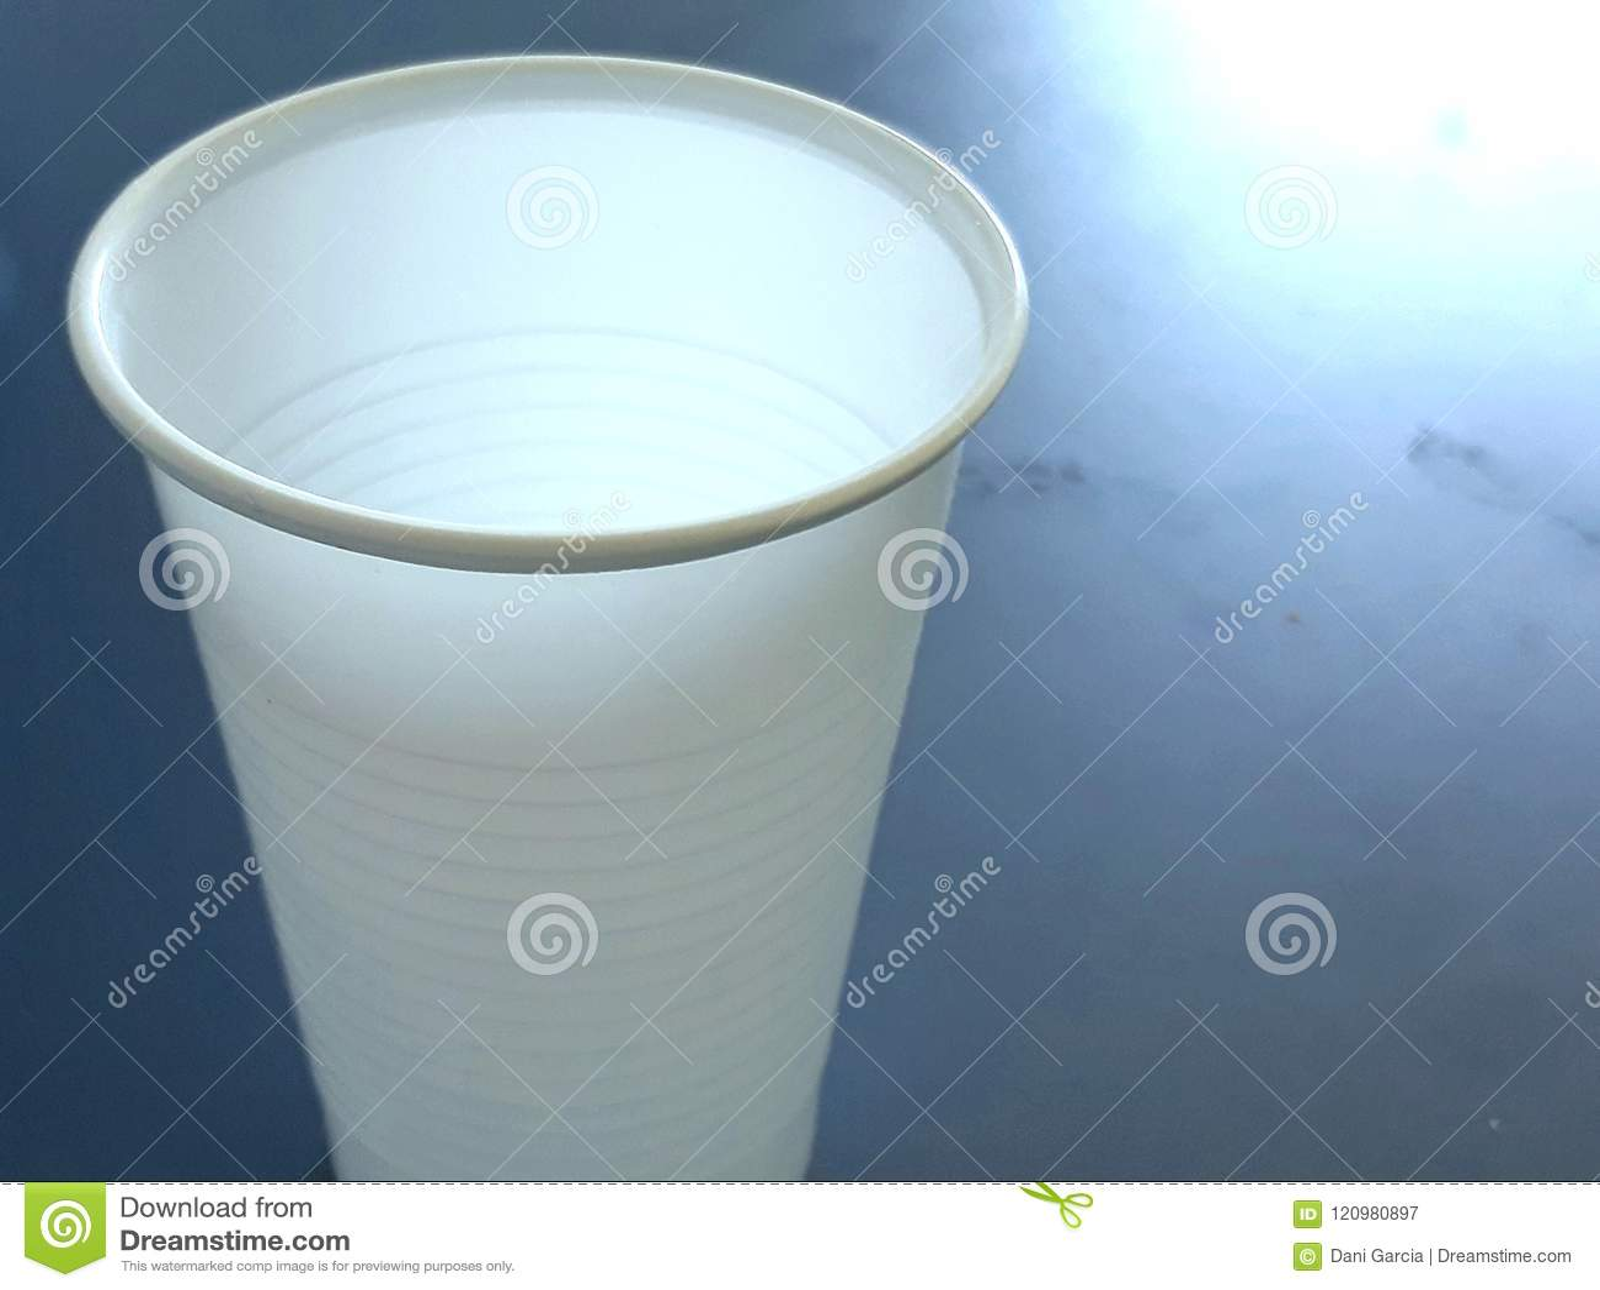 Plastic cup.